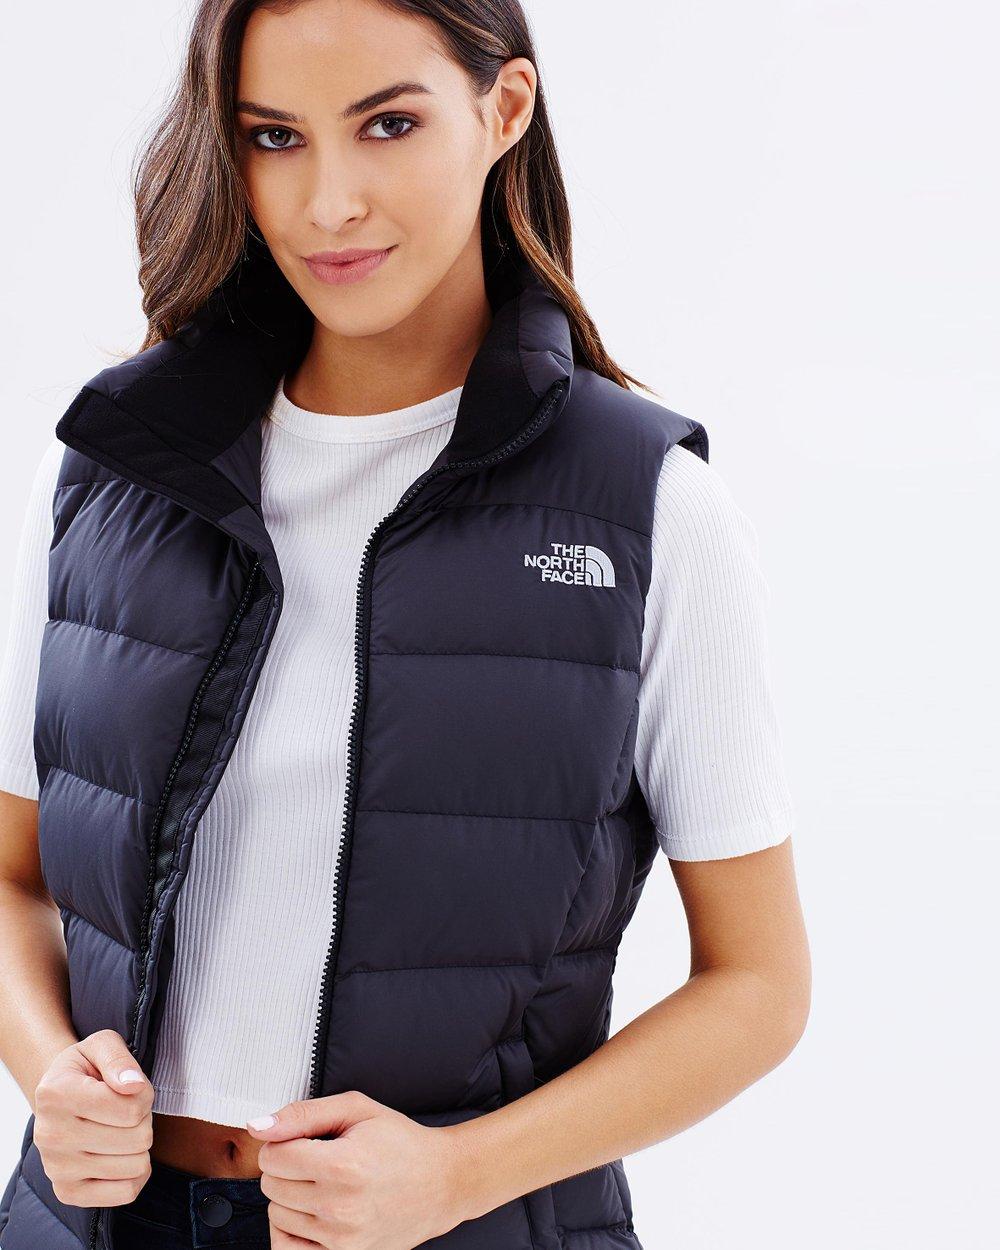 Womens Nuptse 2 Vest by The North Face Online  c9ea0b4e8